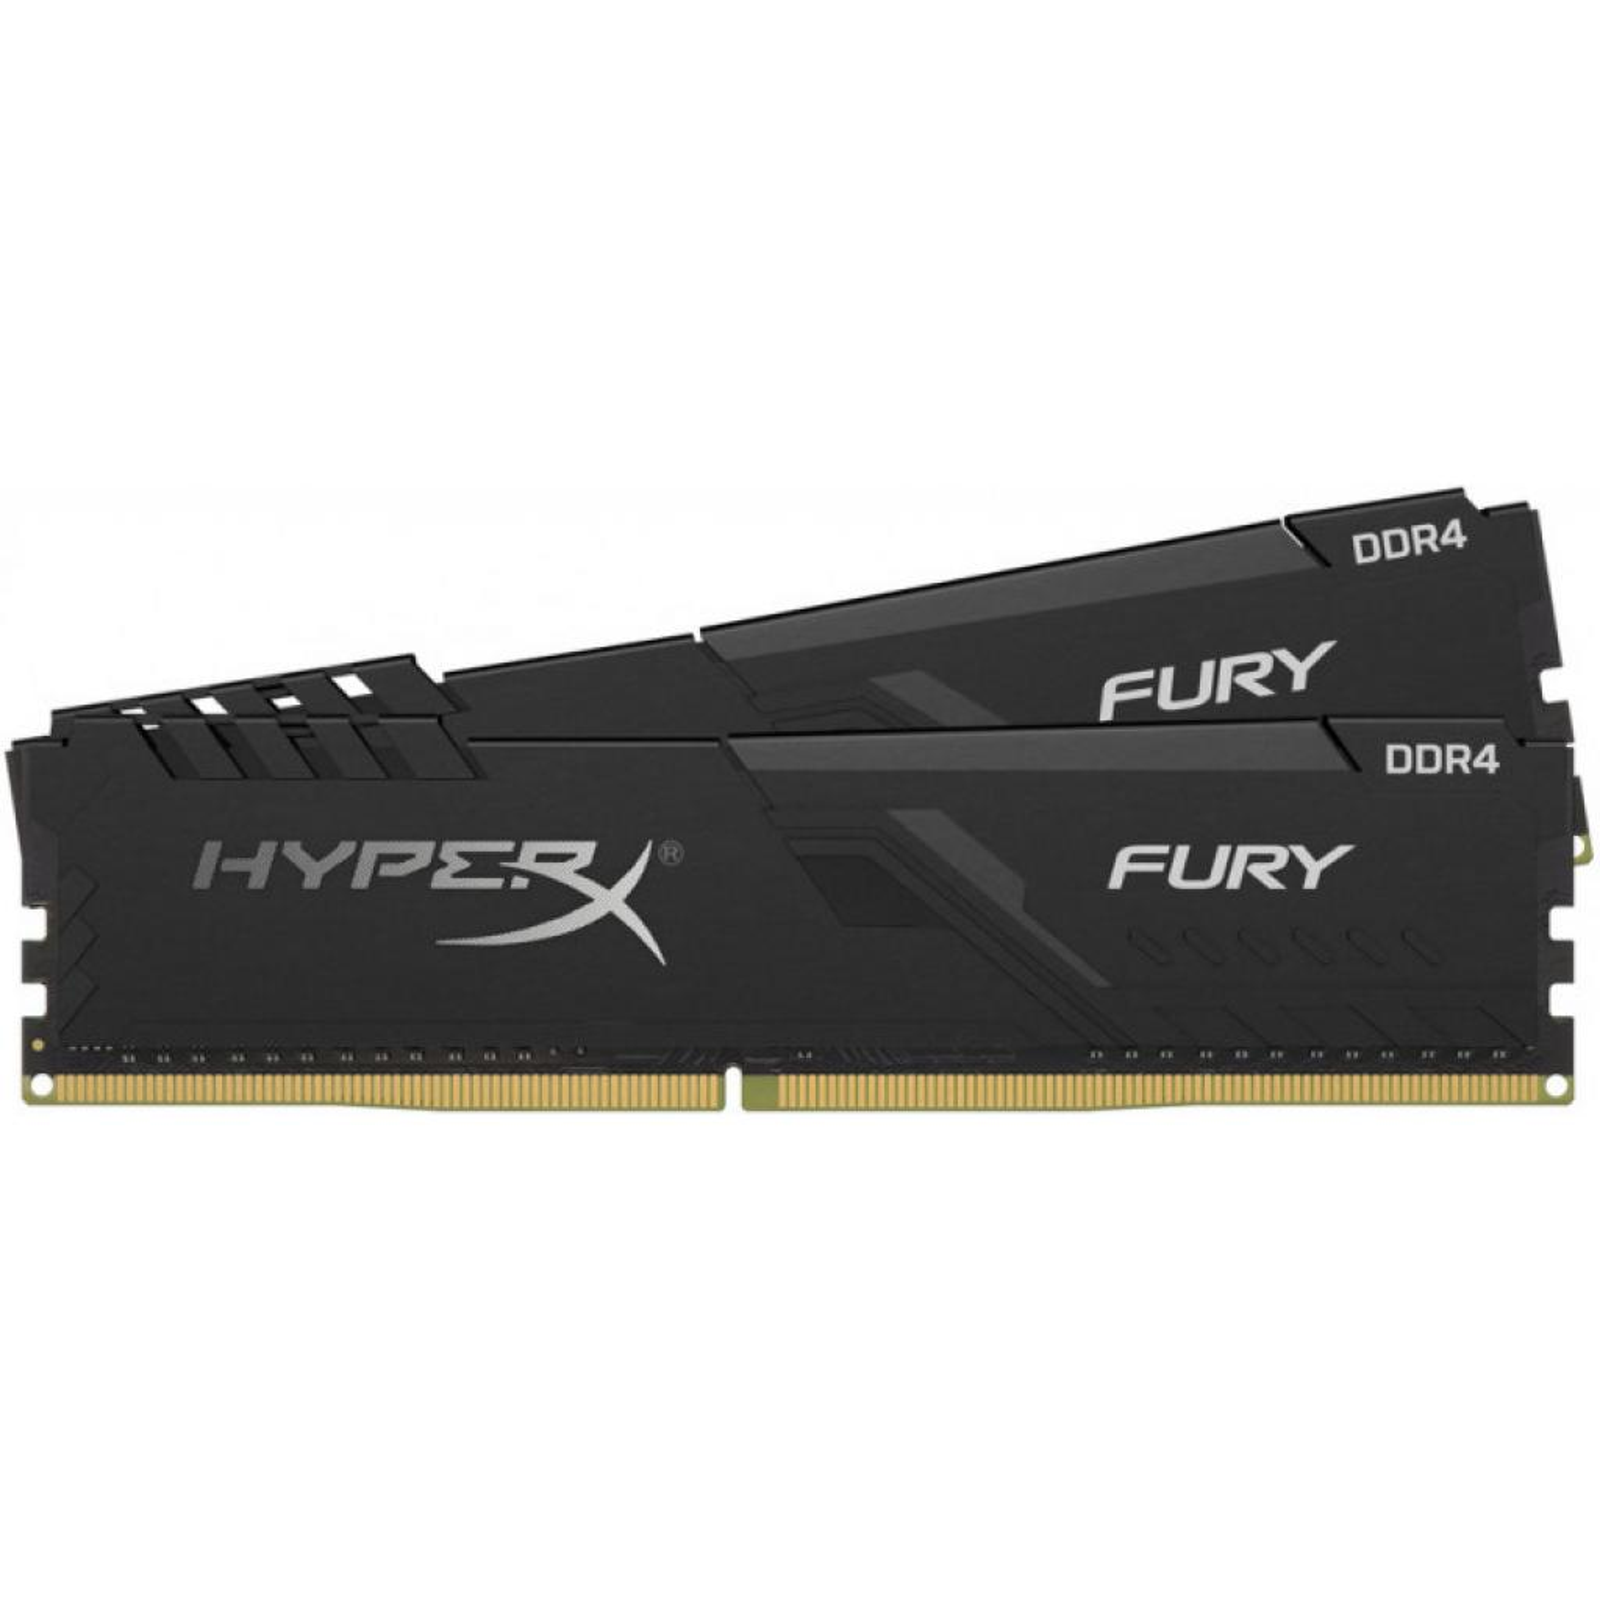 Модуль памяти для компьютера DDR4 16GB (2x8GB) 2666 MHz HyperX Fury Black HyperX (Kingston Fury) (HX426C16FB3K2/16) изображение 2